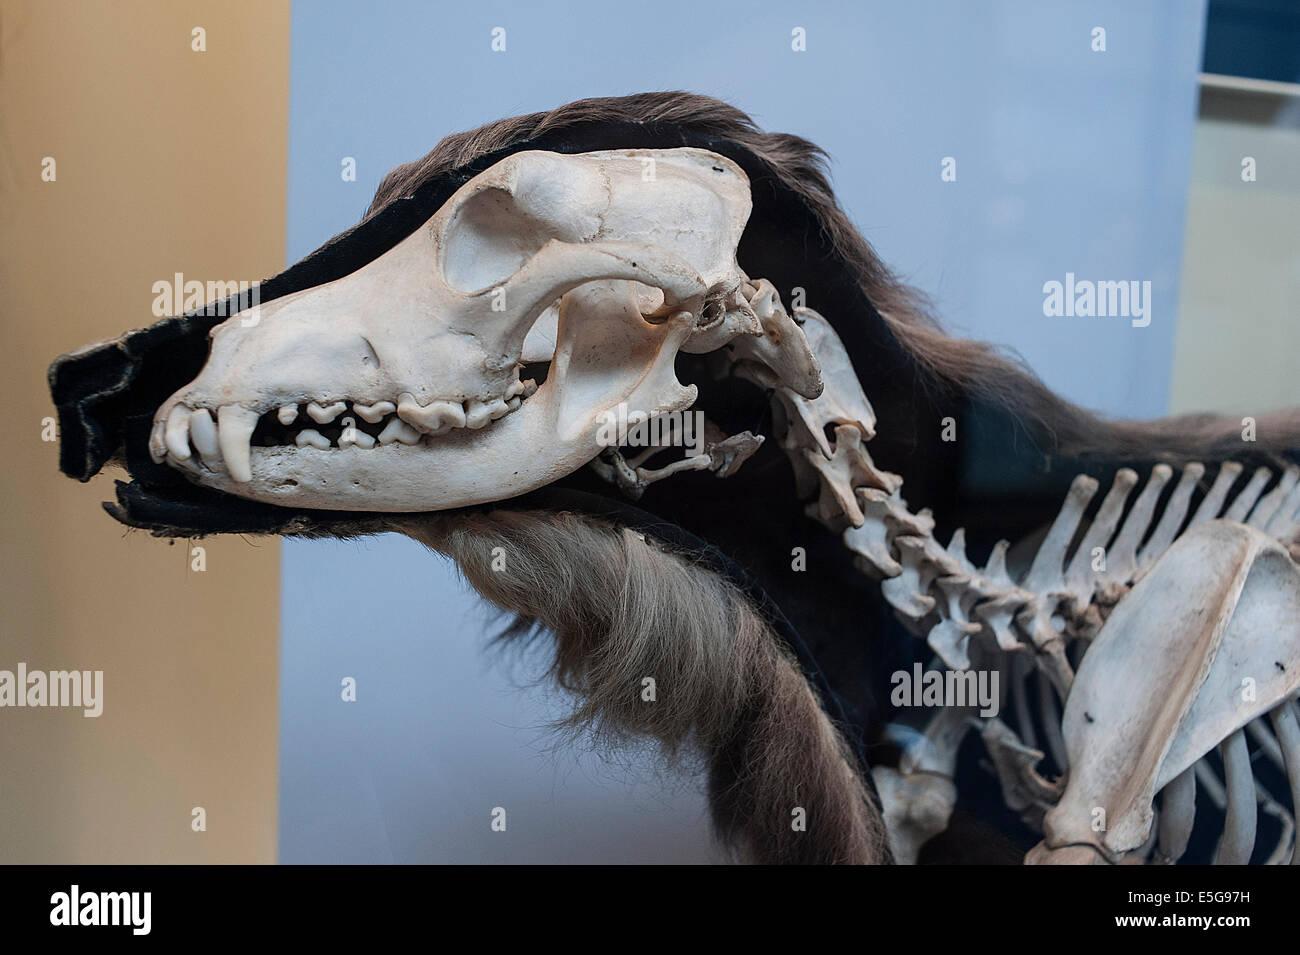 Skeleton of modern dog Canis lupus familiaris, Canidae - Stock Image